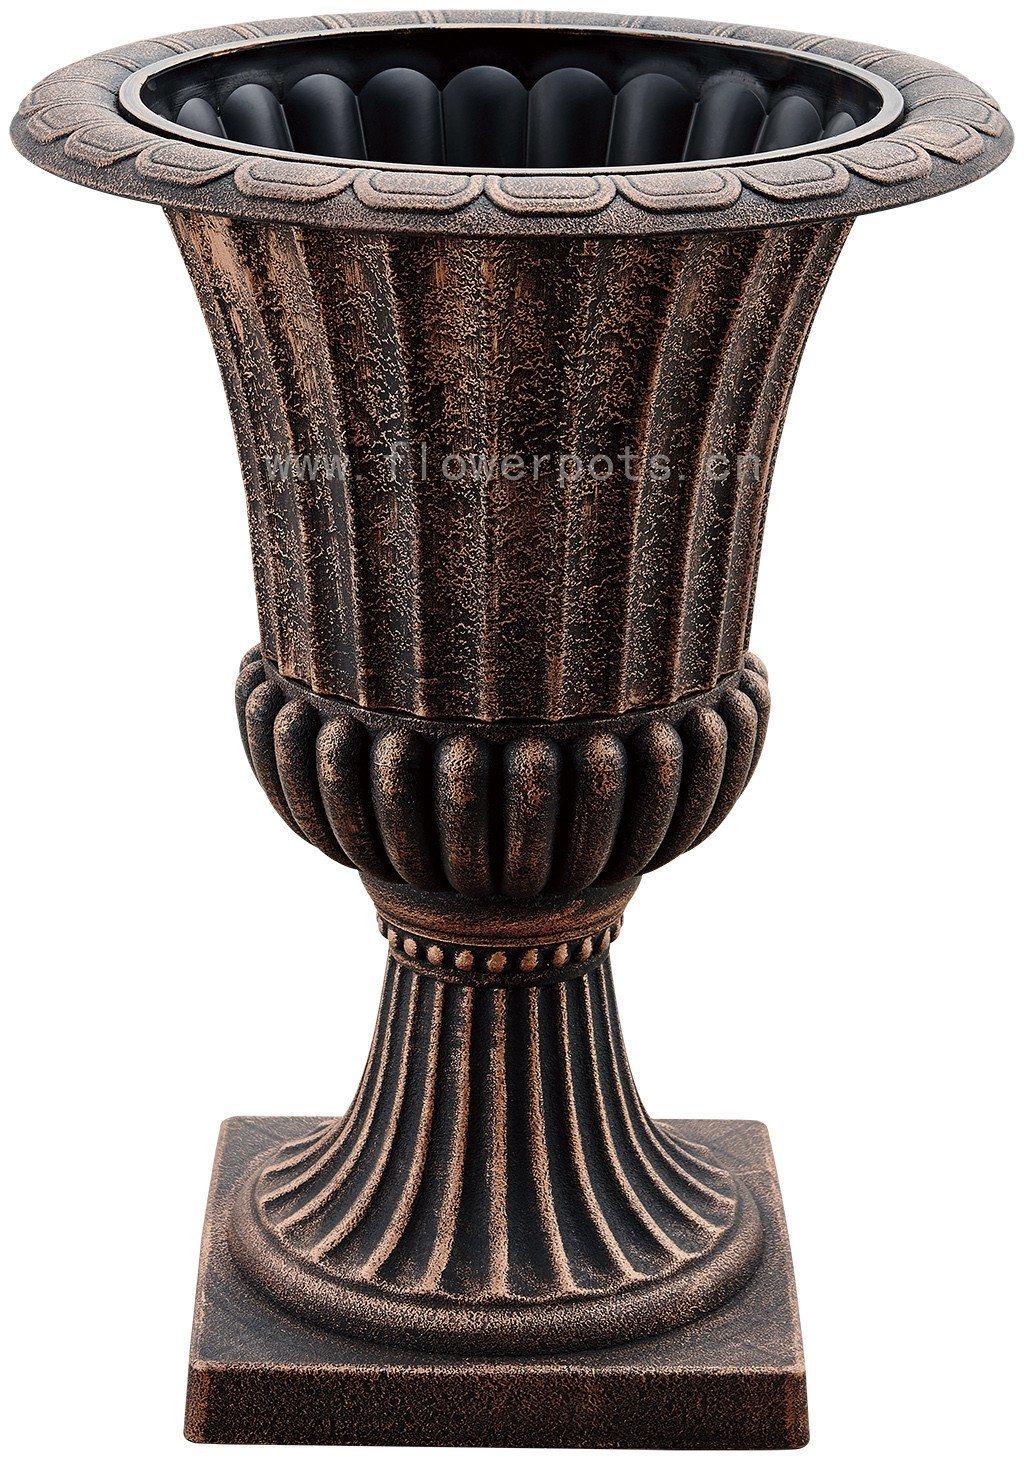 Urn Plastic Flower Pot (KD2961S-KD2962S)